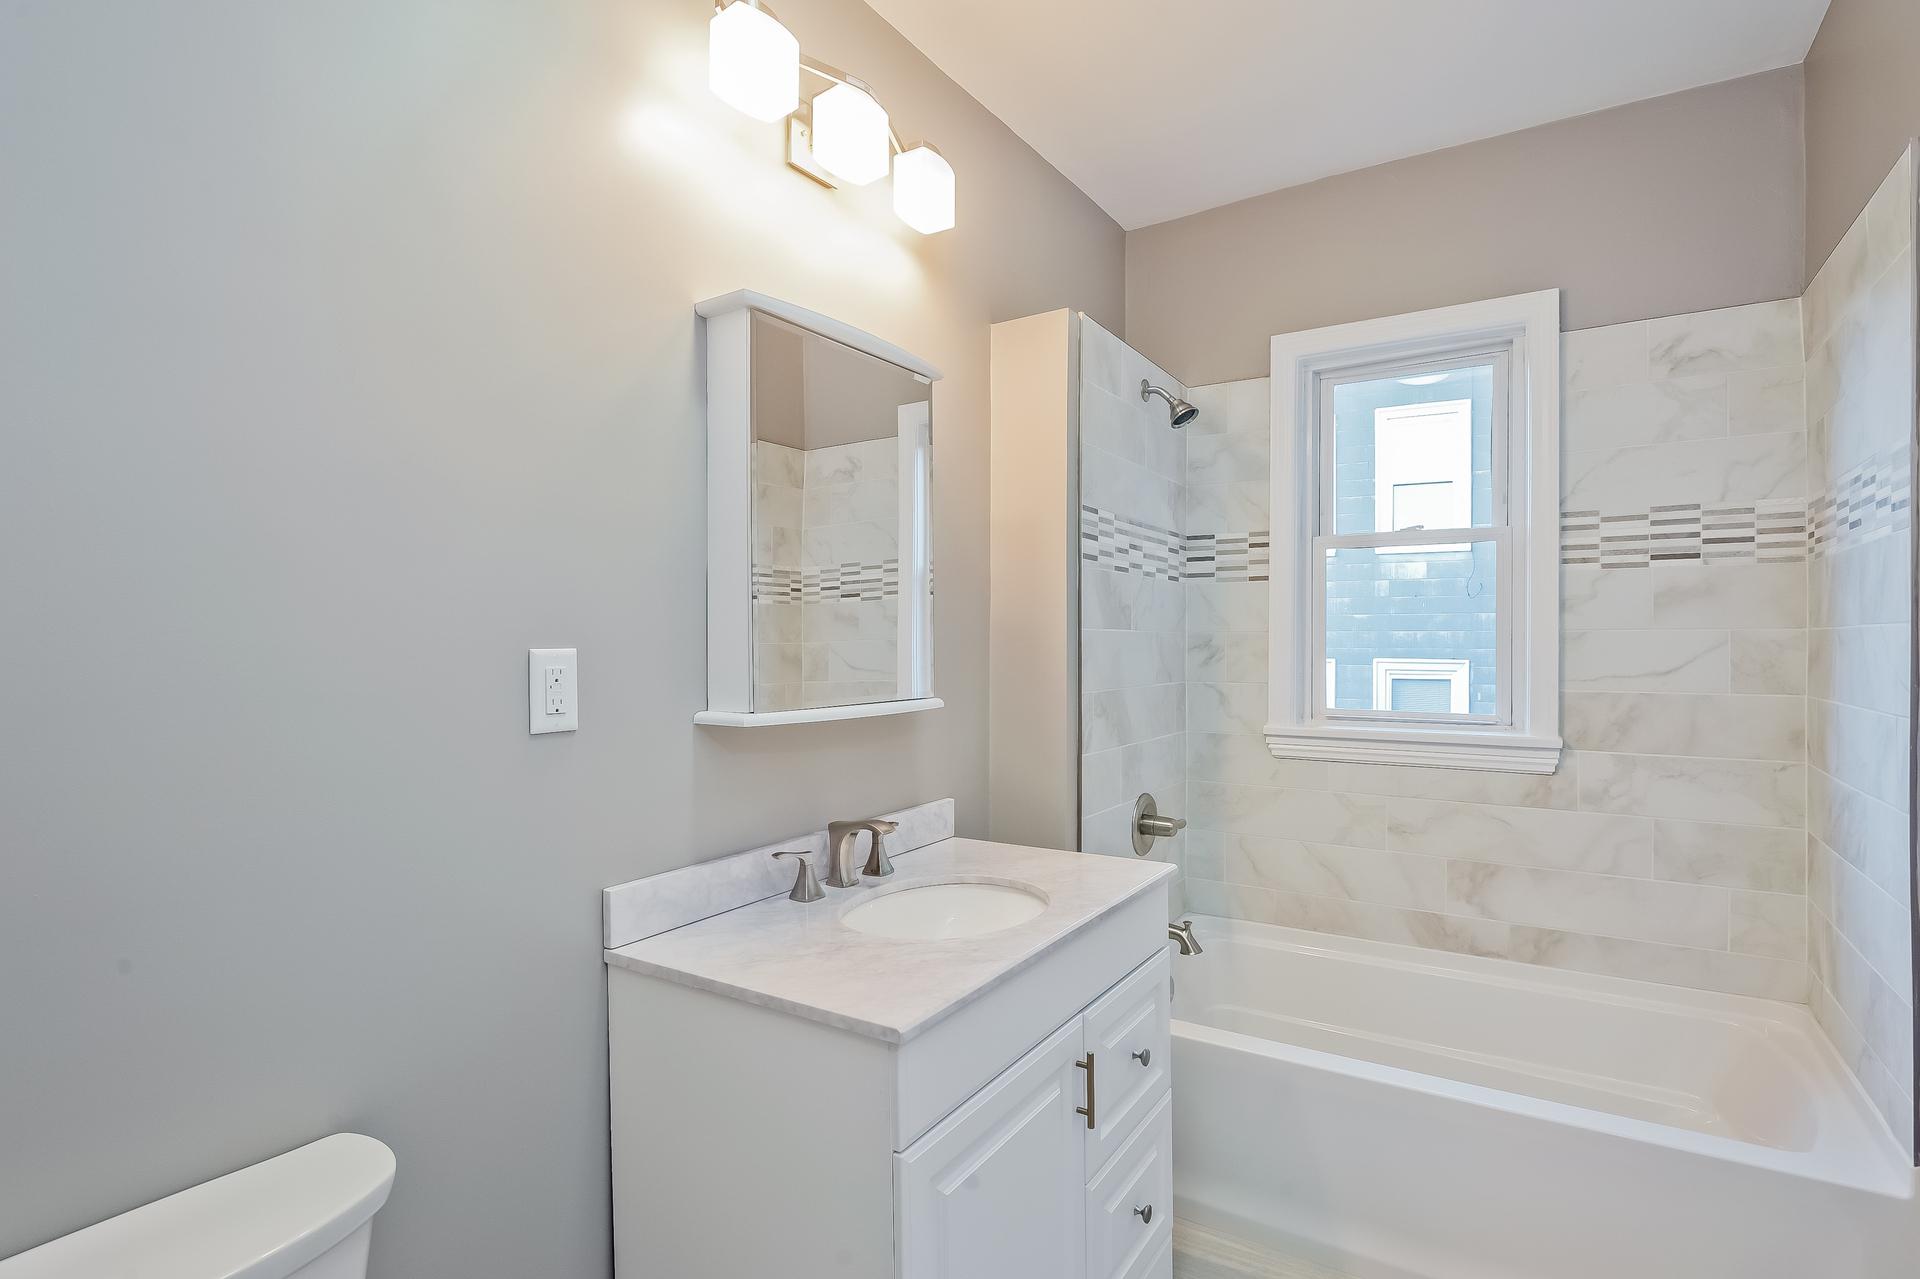 016-Bathroom-2172751-medium.jpg